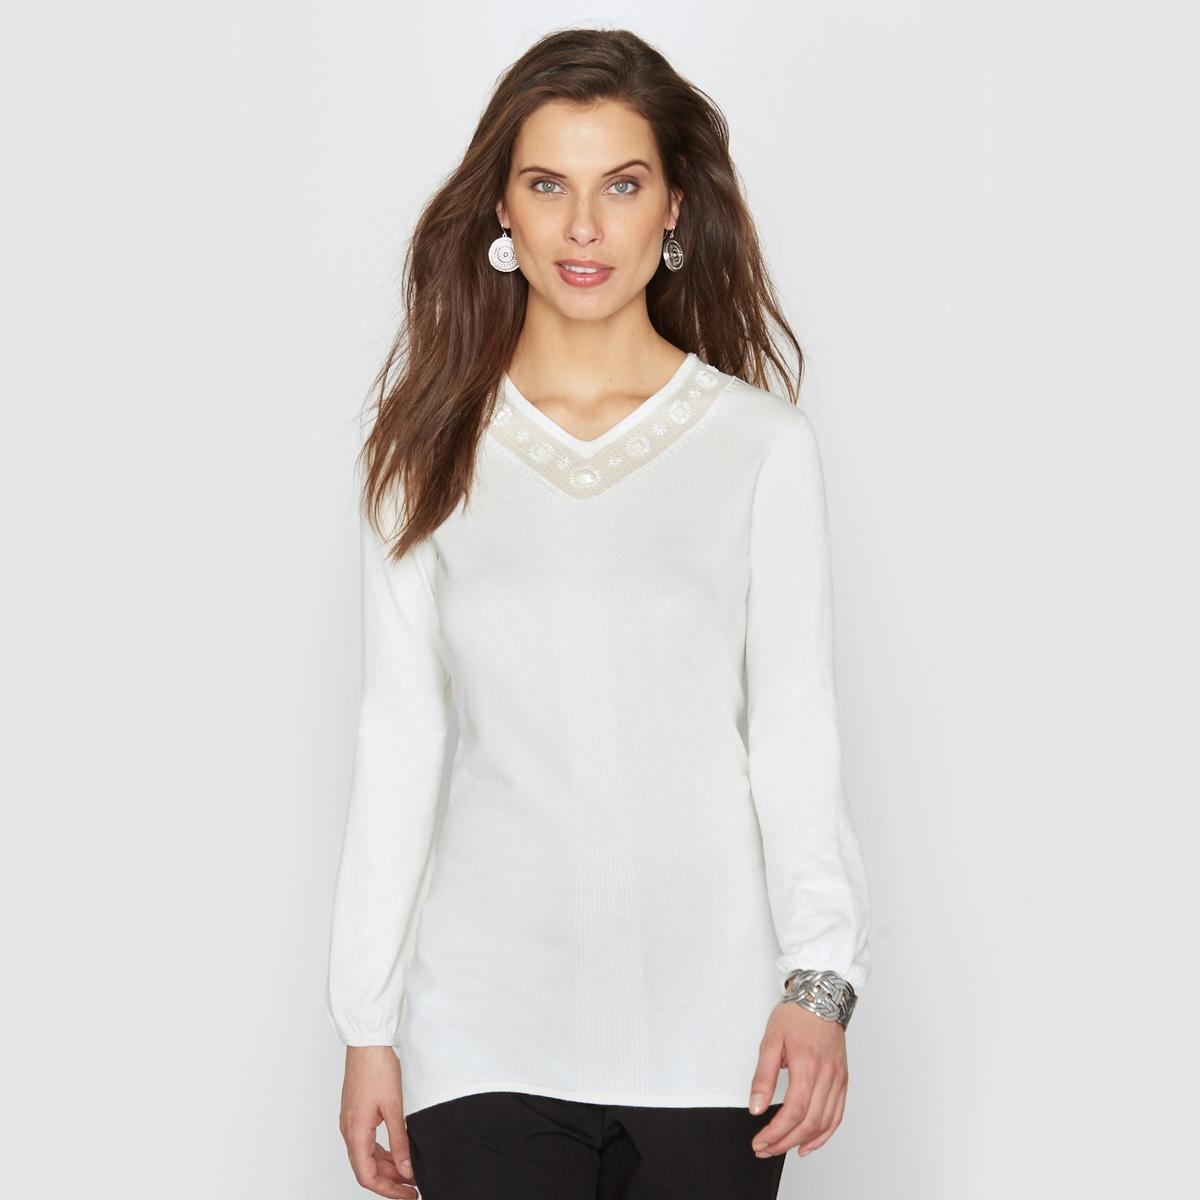 Пуловер с украшением от ANNE WEYBURN